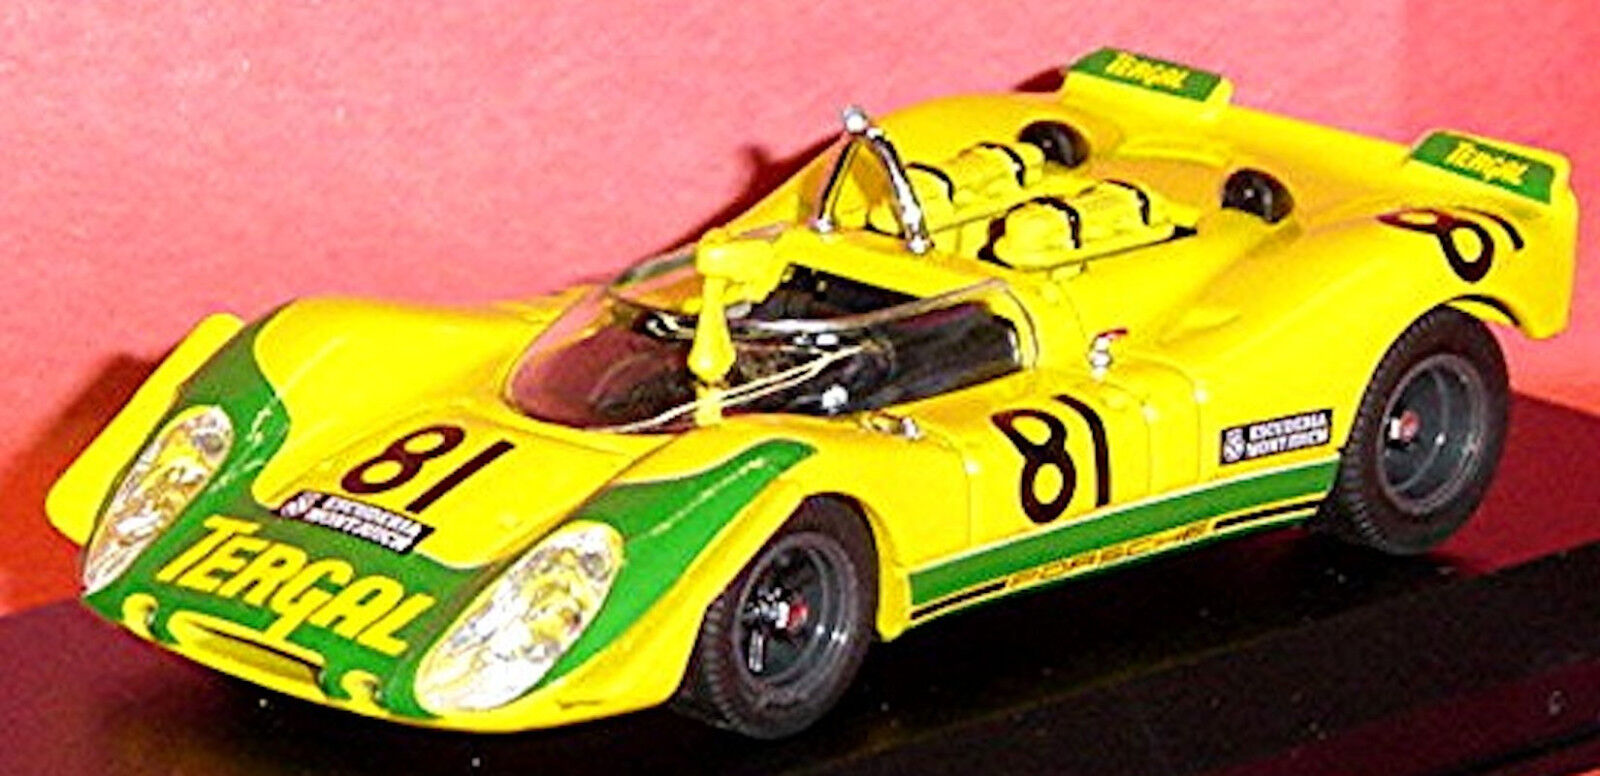 PORSCHE 908 2 temporada 1969 J. FERNANDEZ FERNANDEZ FERNANDEZ 81 1 43 Best Model 67c0c9